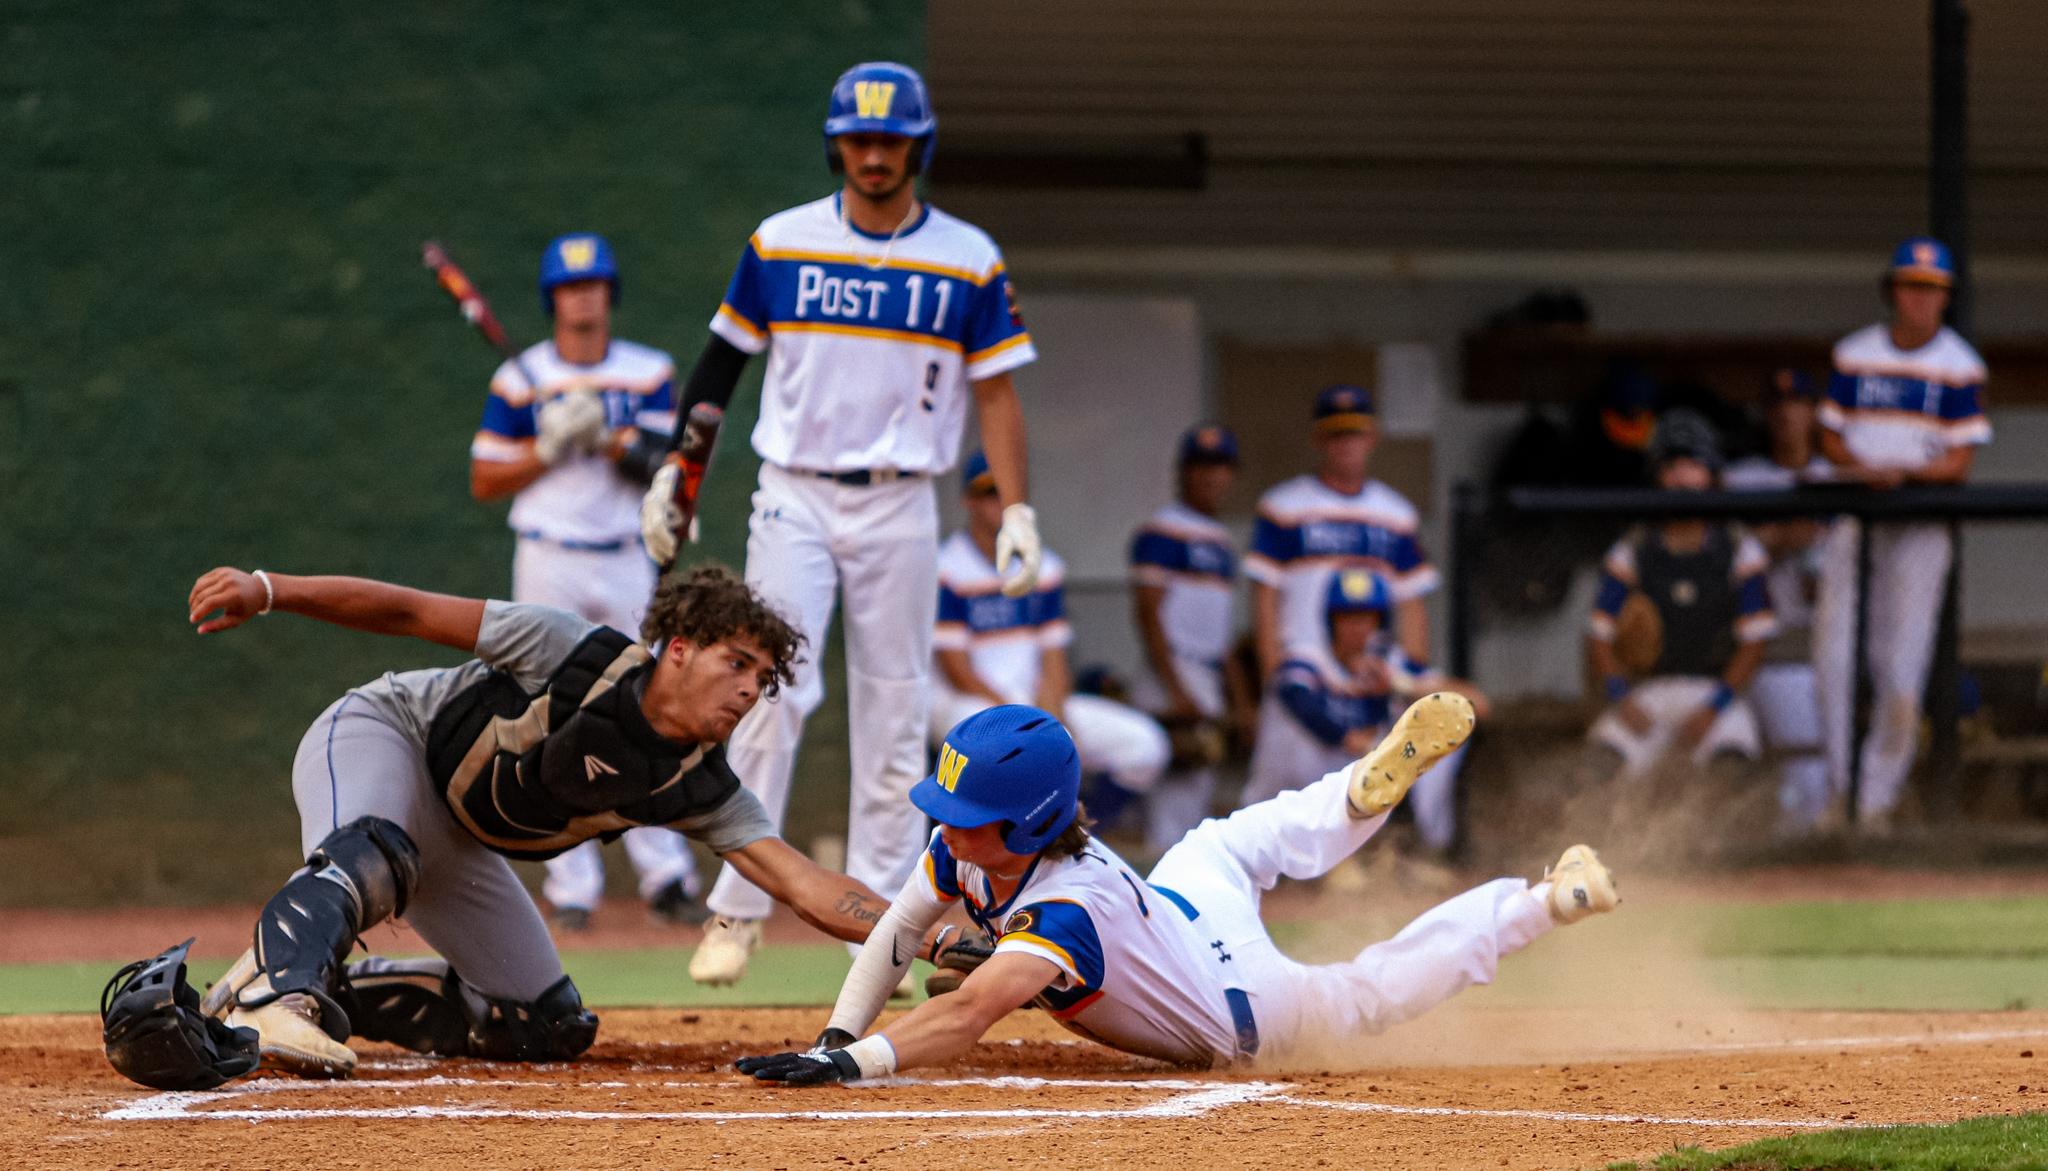 Baseball: Post 11 Holds Off Kinston Post 43 (PHOTO GALLERY)